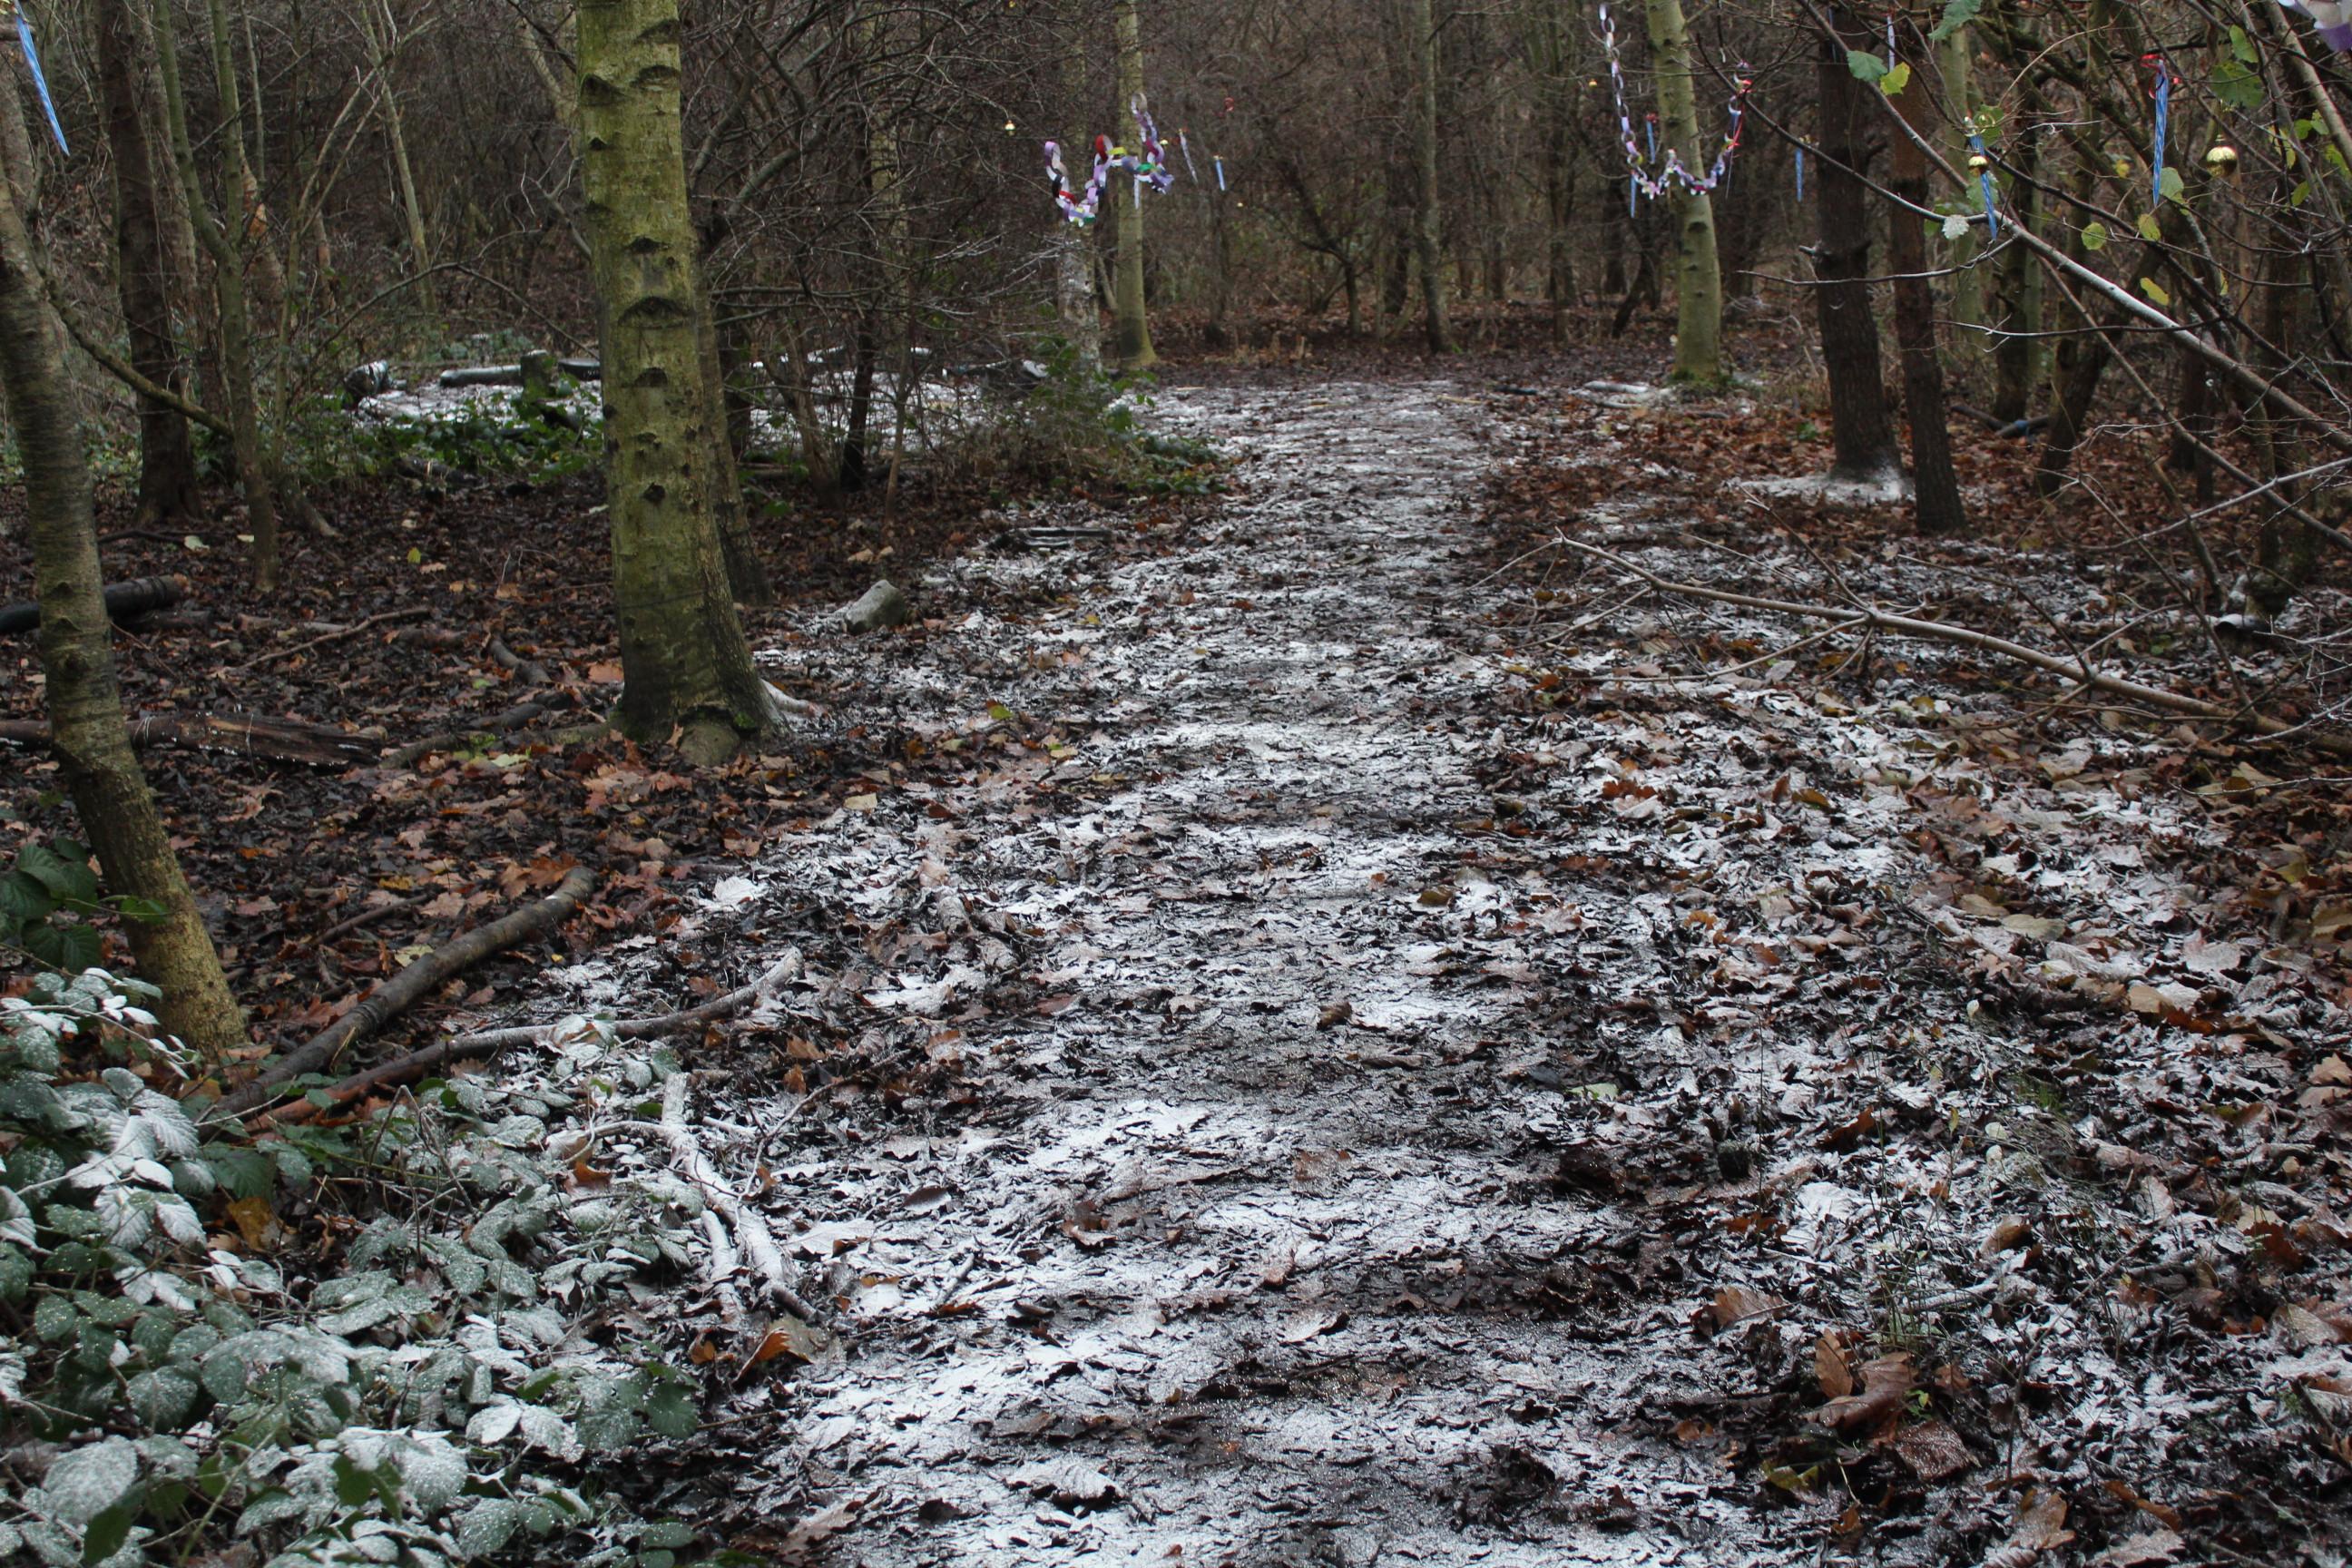 winter-wonderland-pcfc-19-12-31